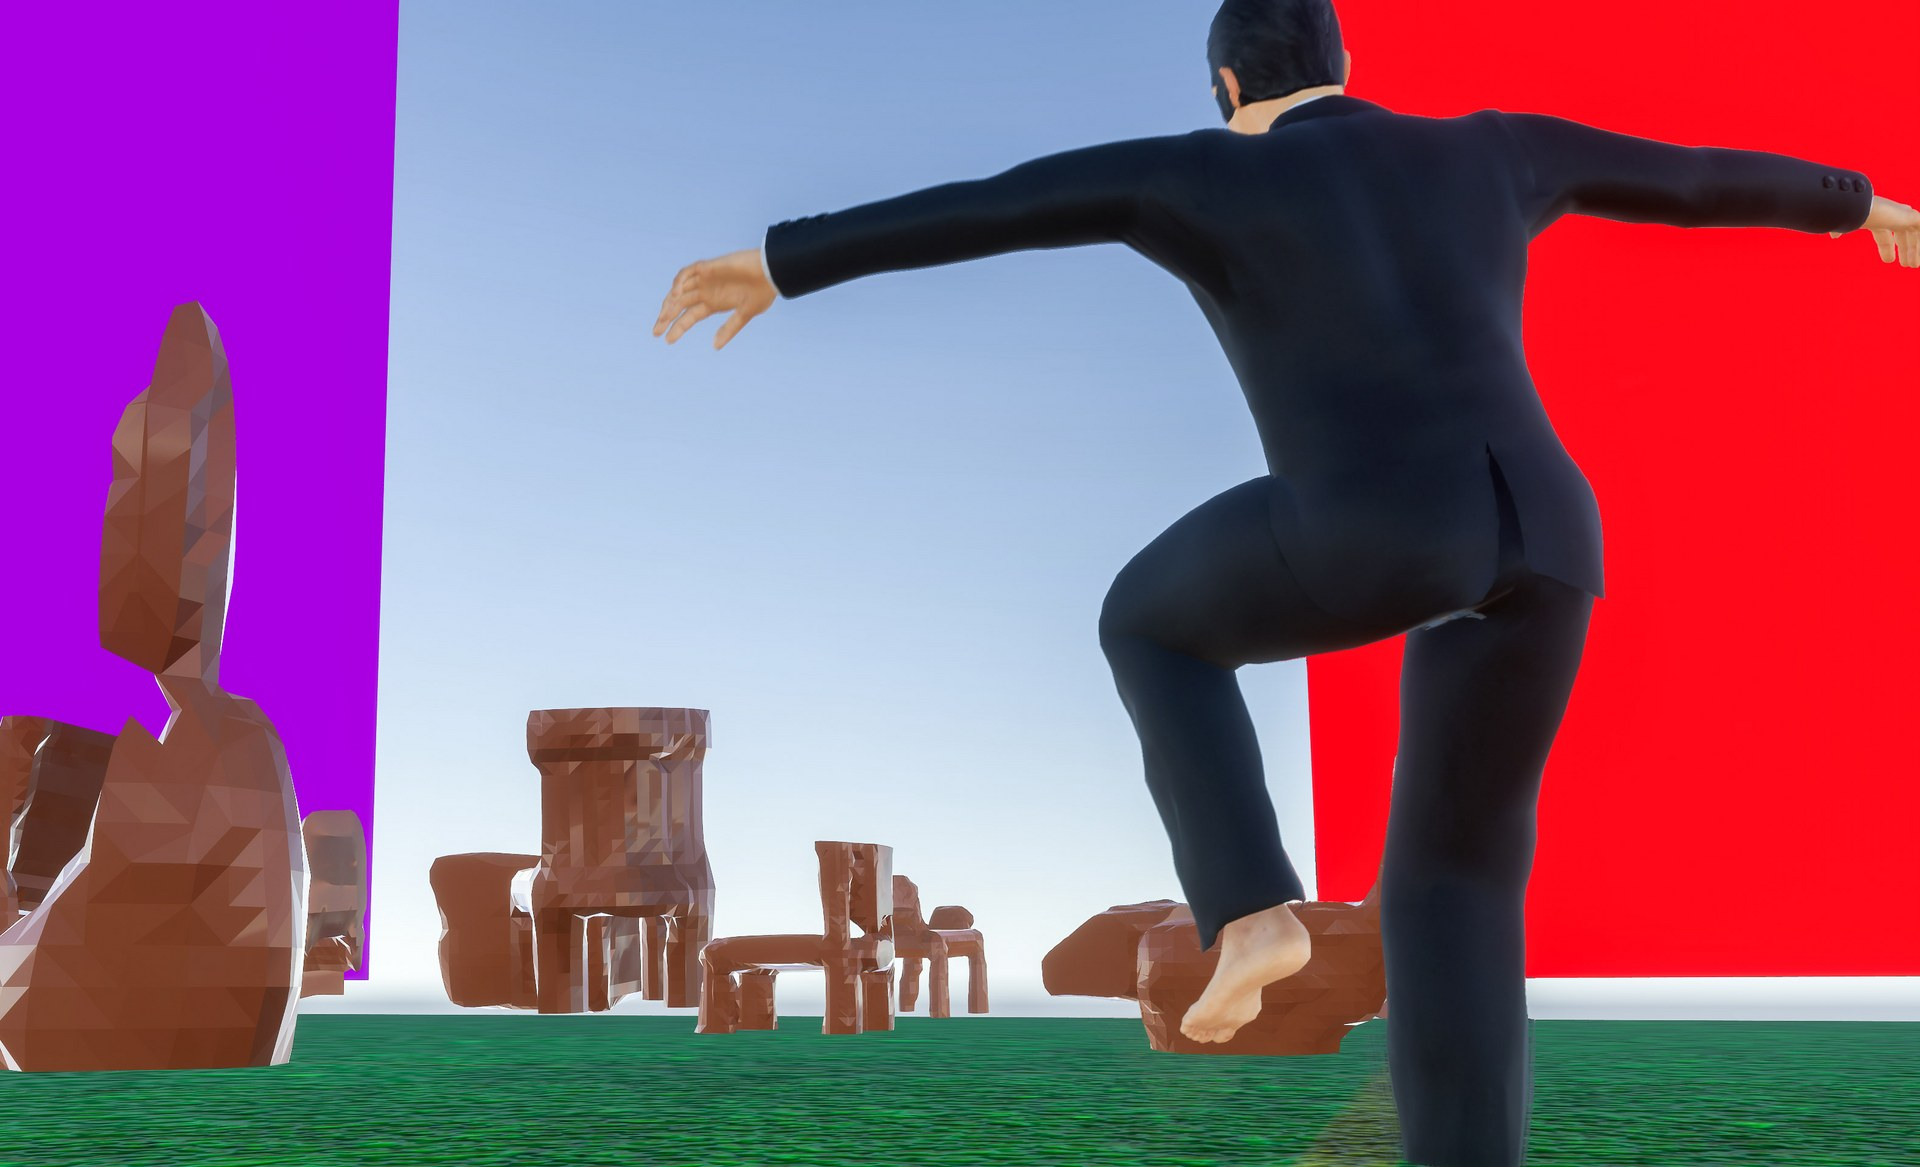 VR view from 7 Ways of emptying myself (Still)